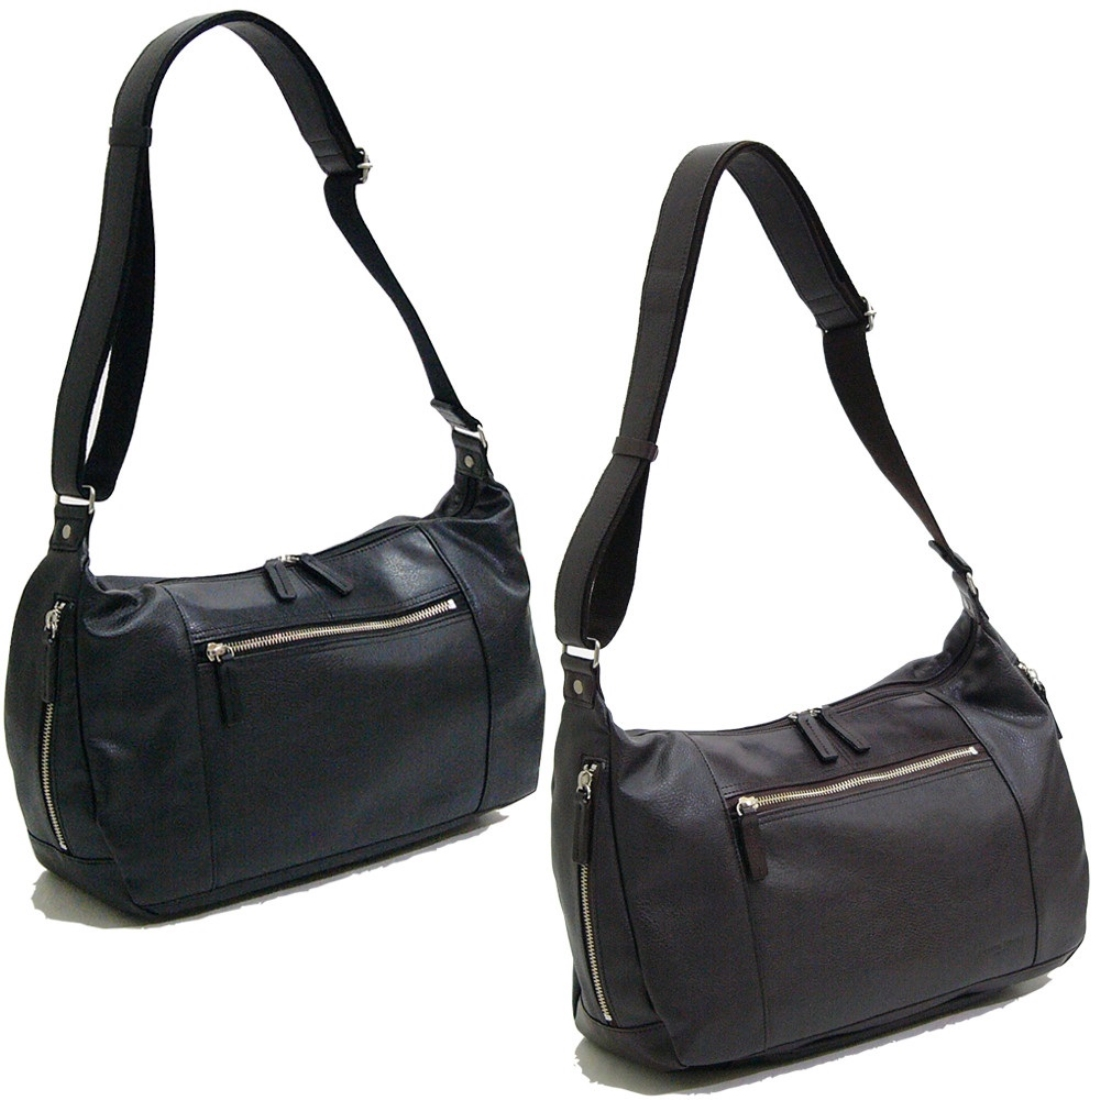 V.S.ショルダーバッグ ブラック 日本製日本 ショルダー バッグ 鞄 合成皮革